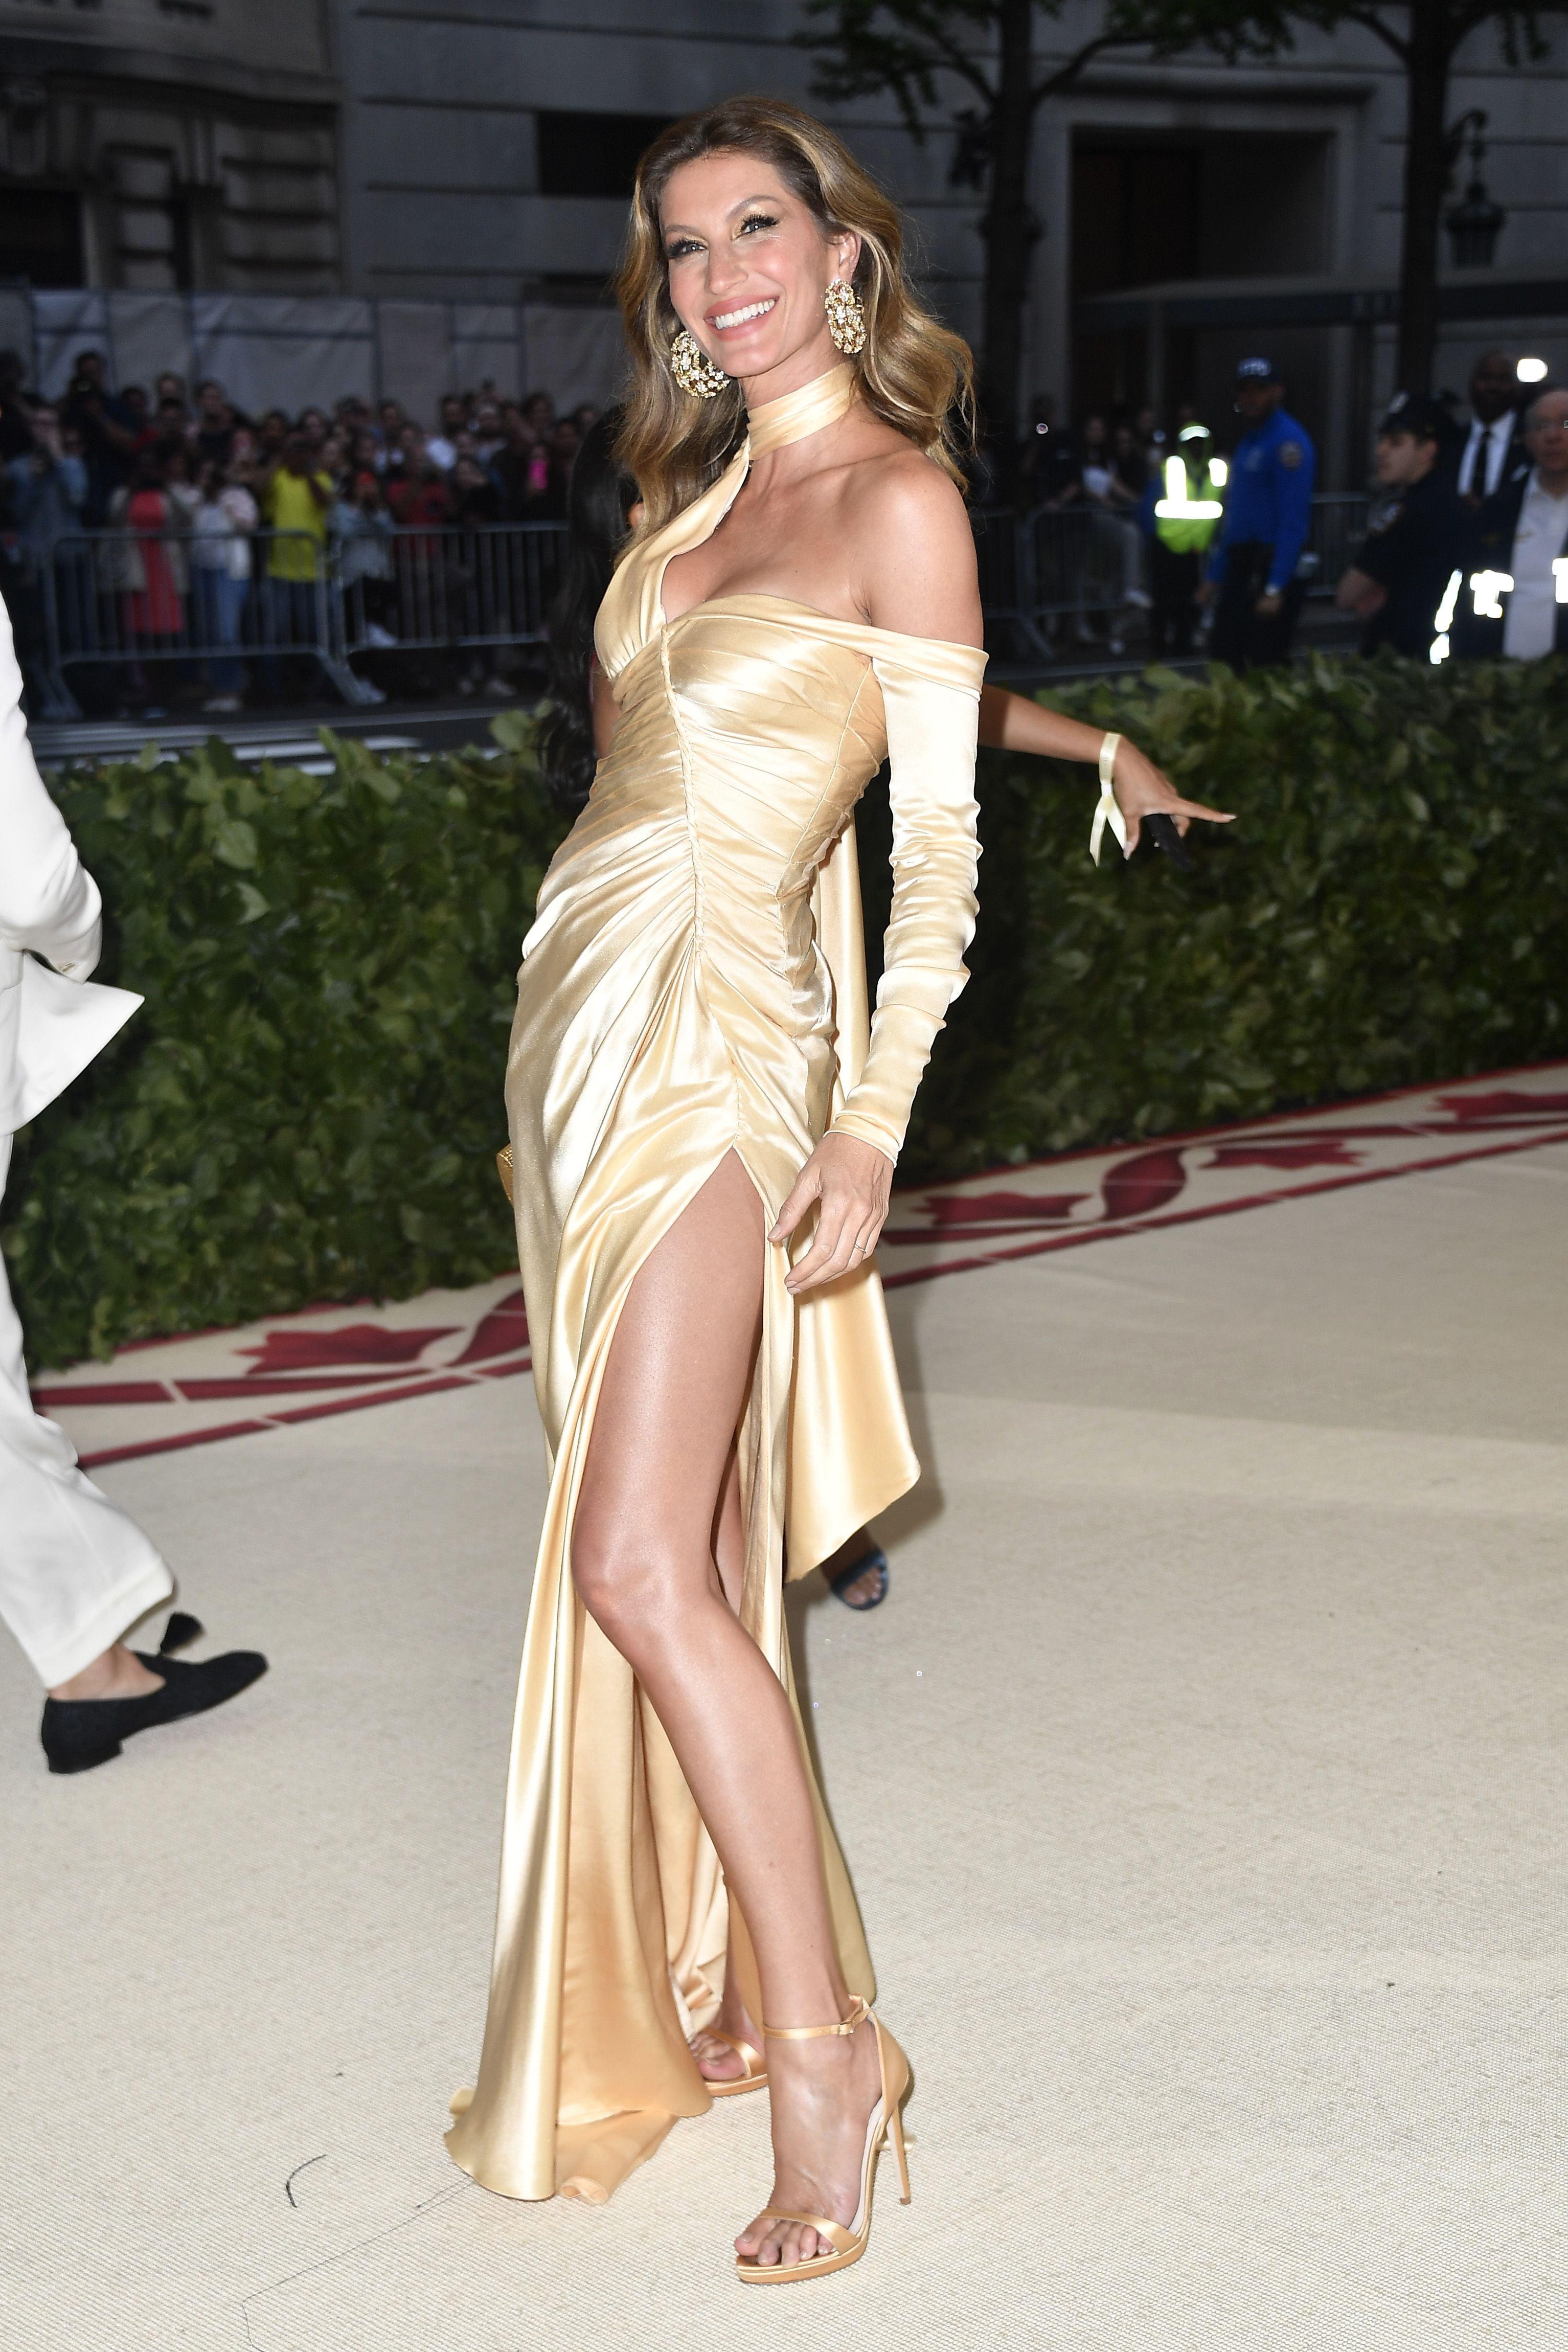 Nudes of khloe kardashian